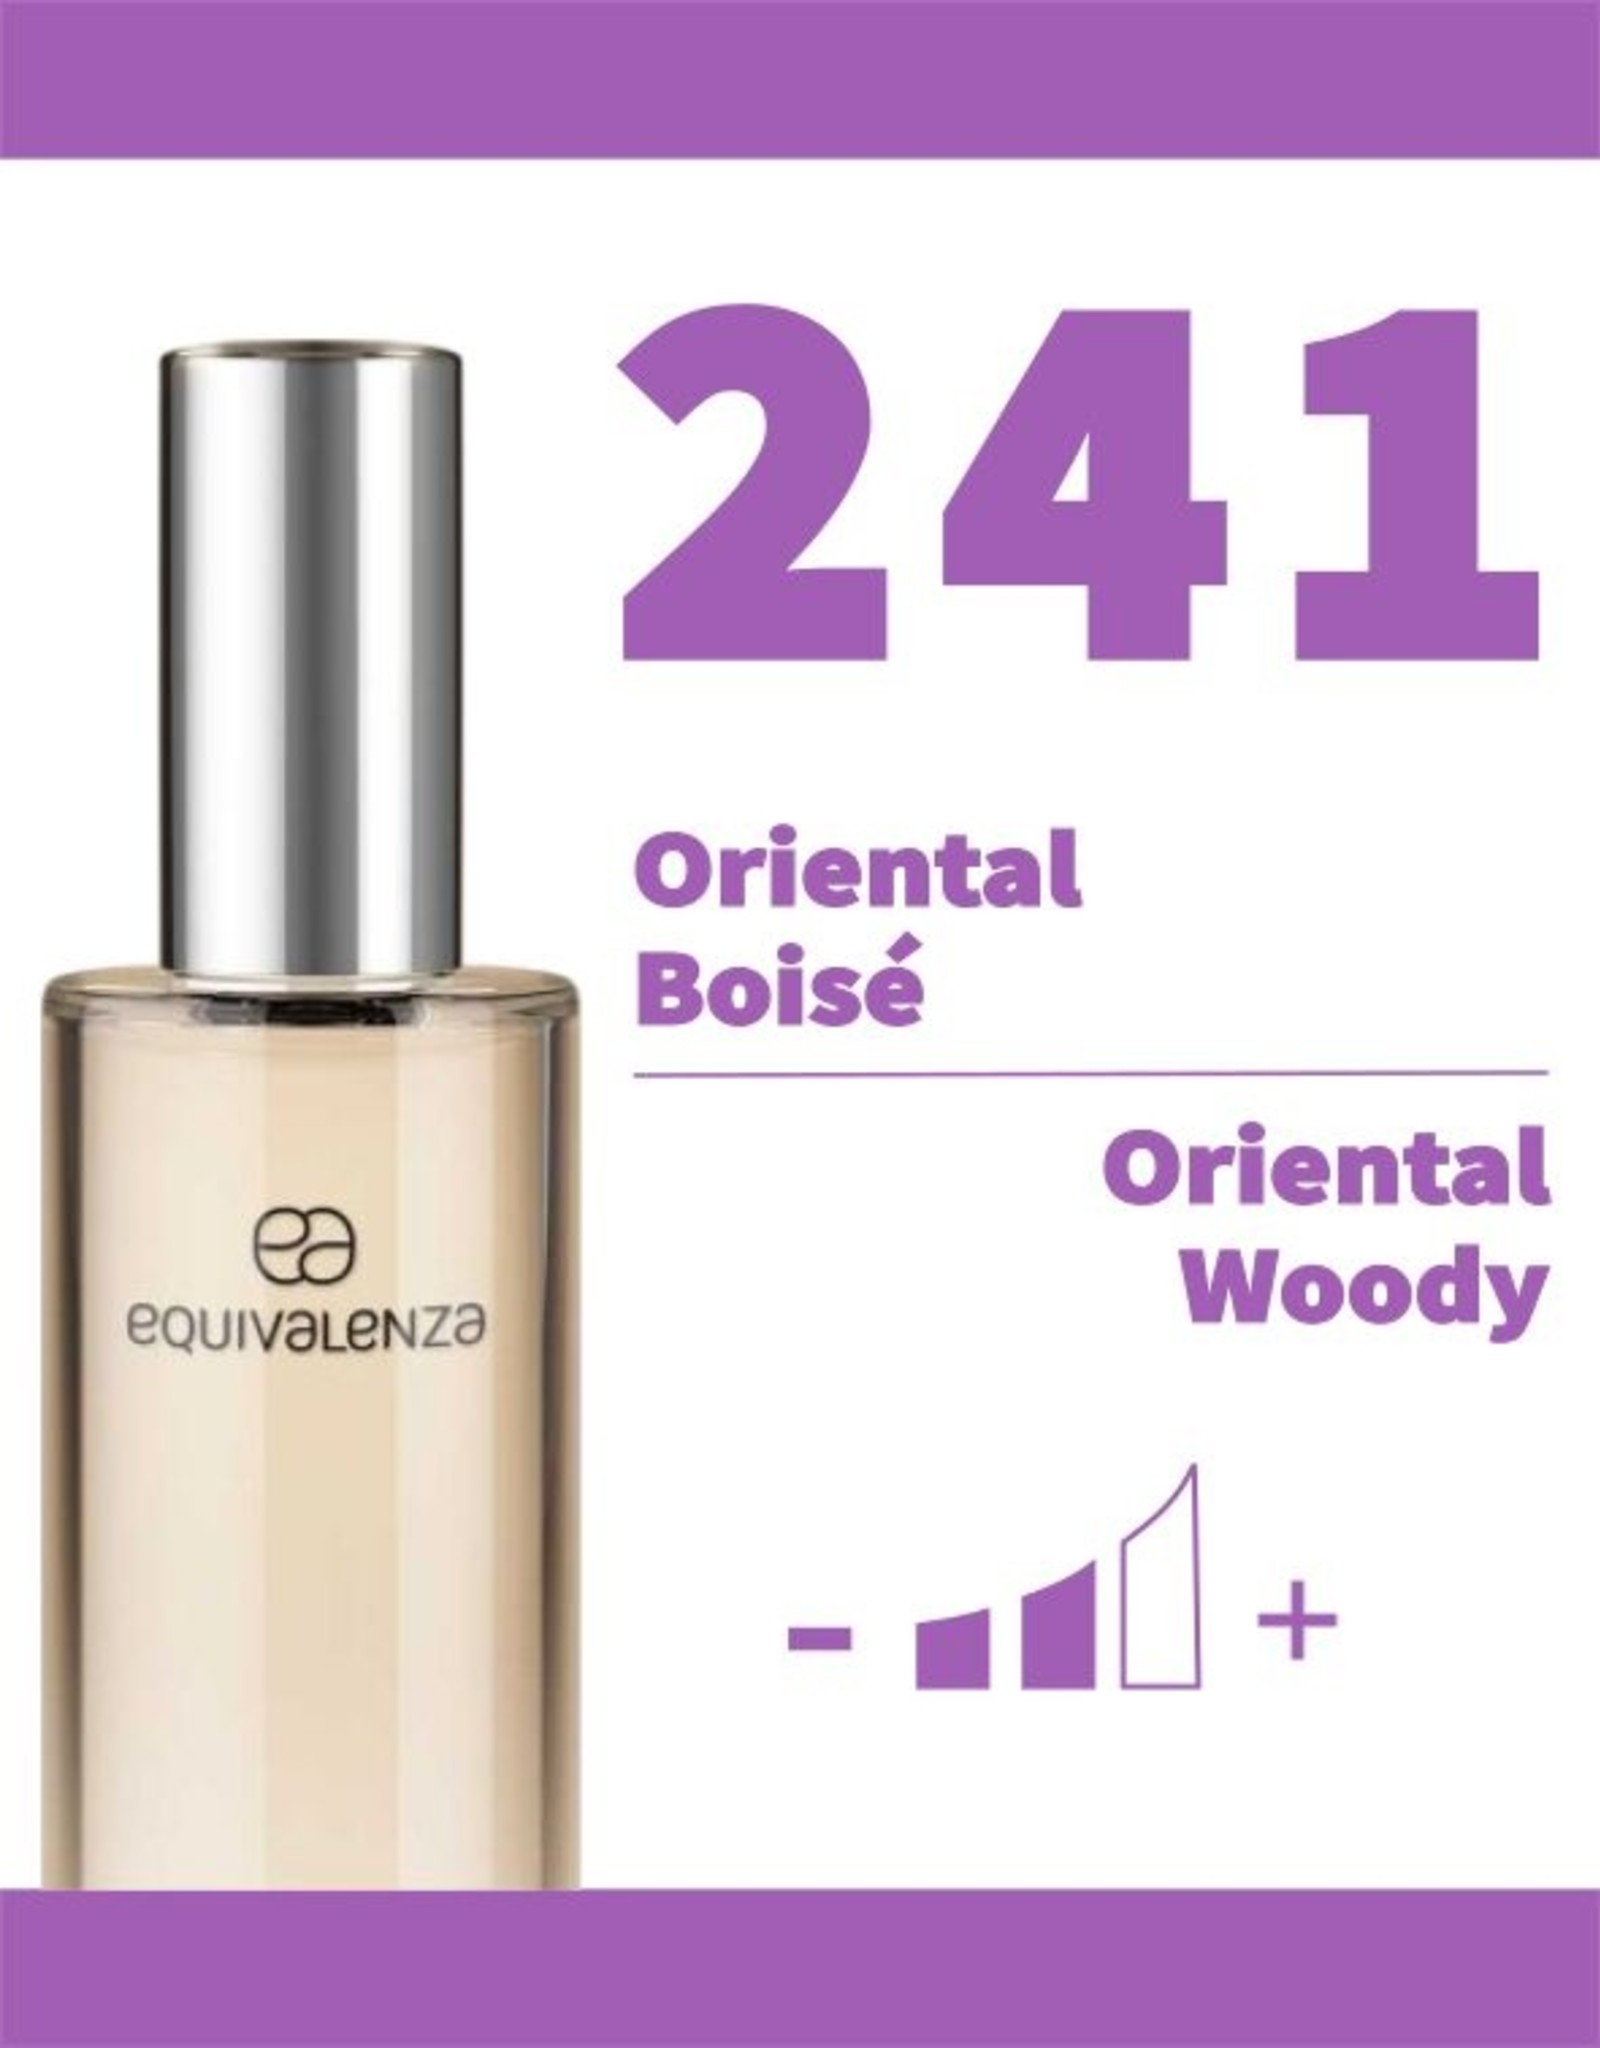 Equivalenza Eau de Toilette Oriental Woody 241